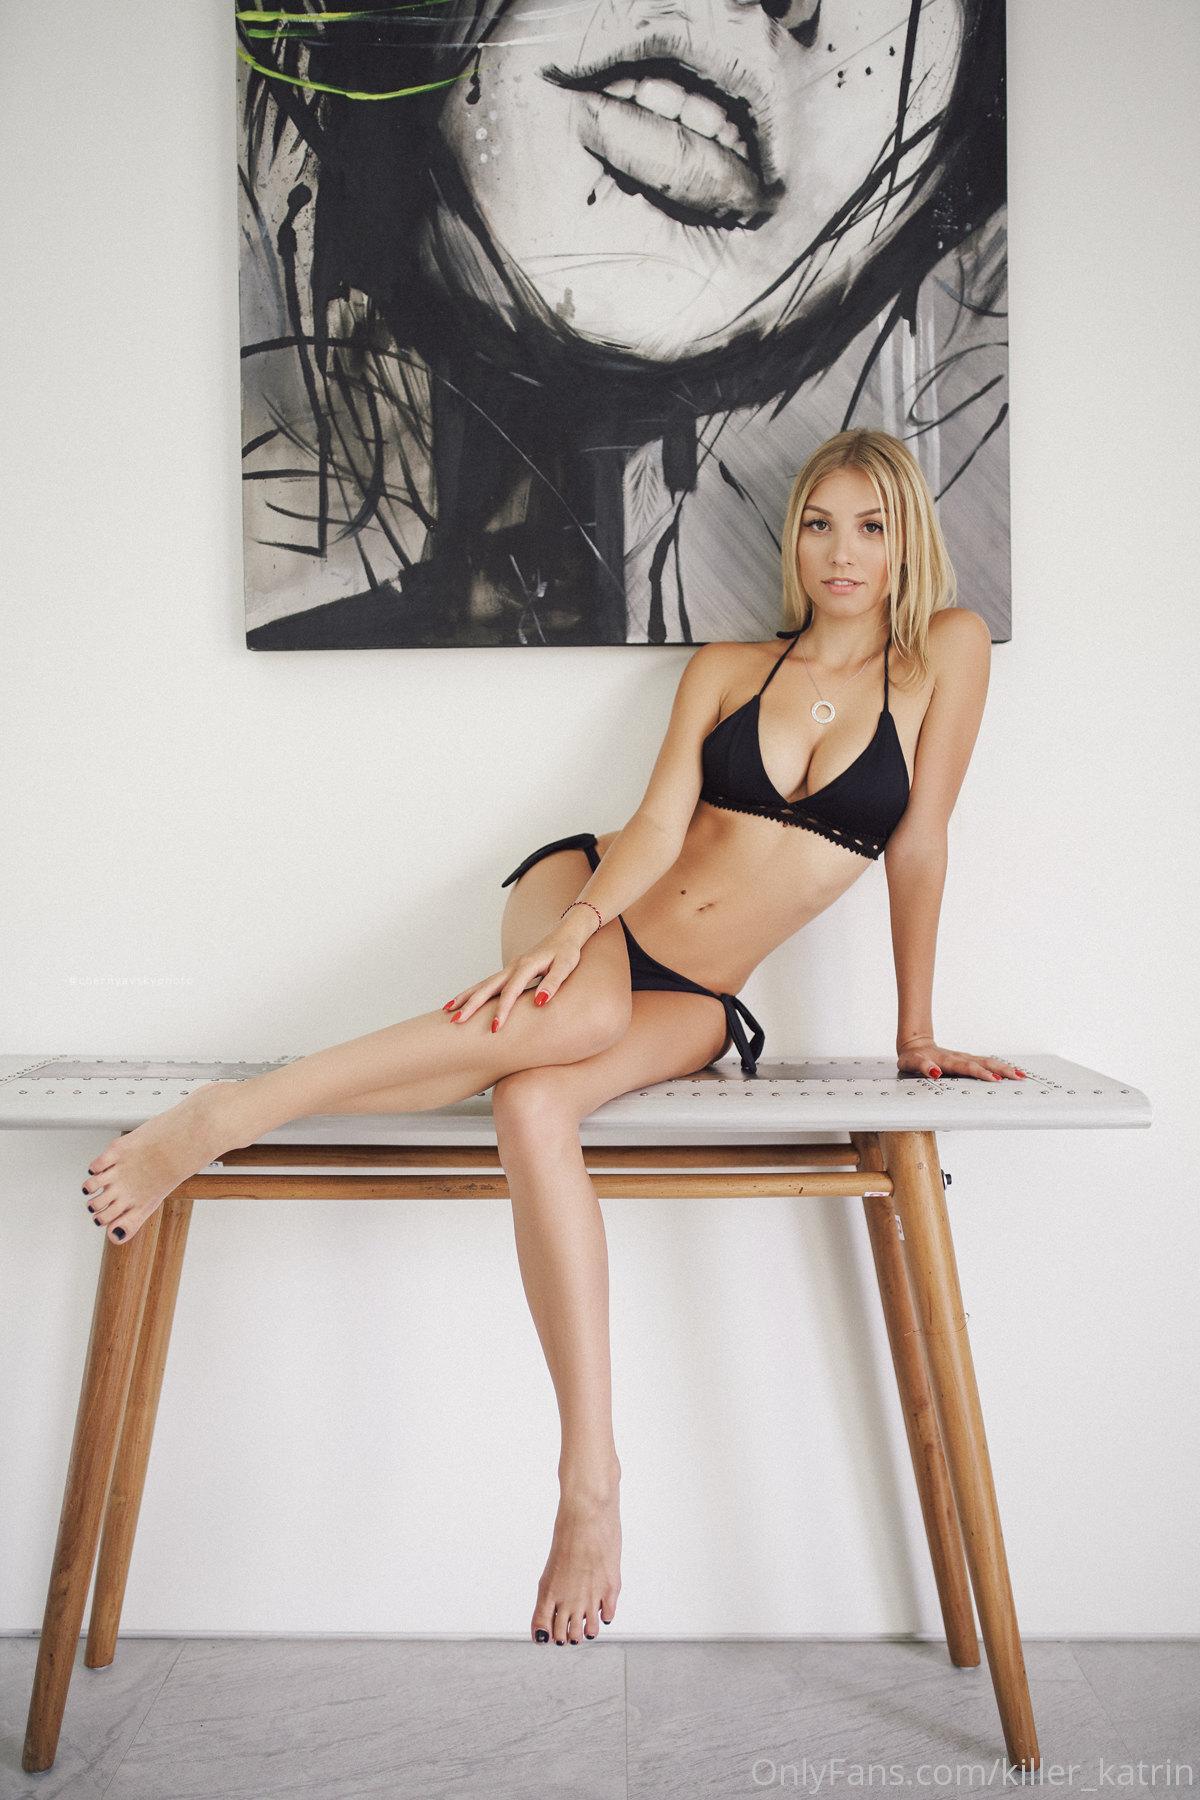 Killer Katrin Nude Strip Onlyfans Set Leaked Nxsemc